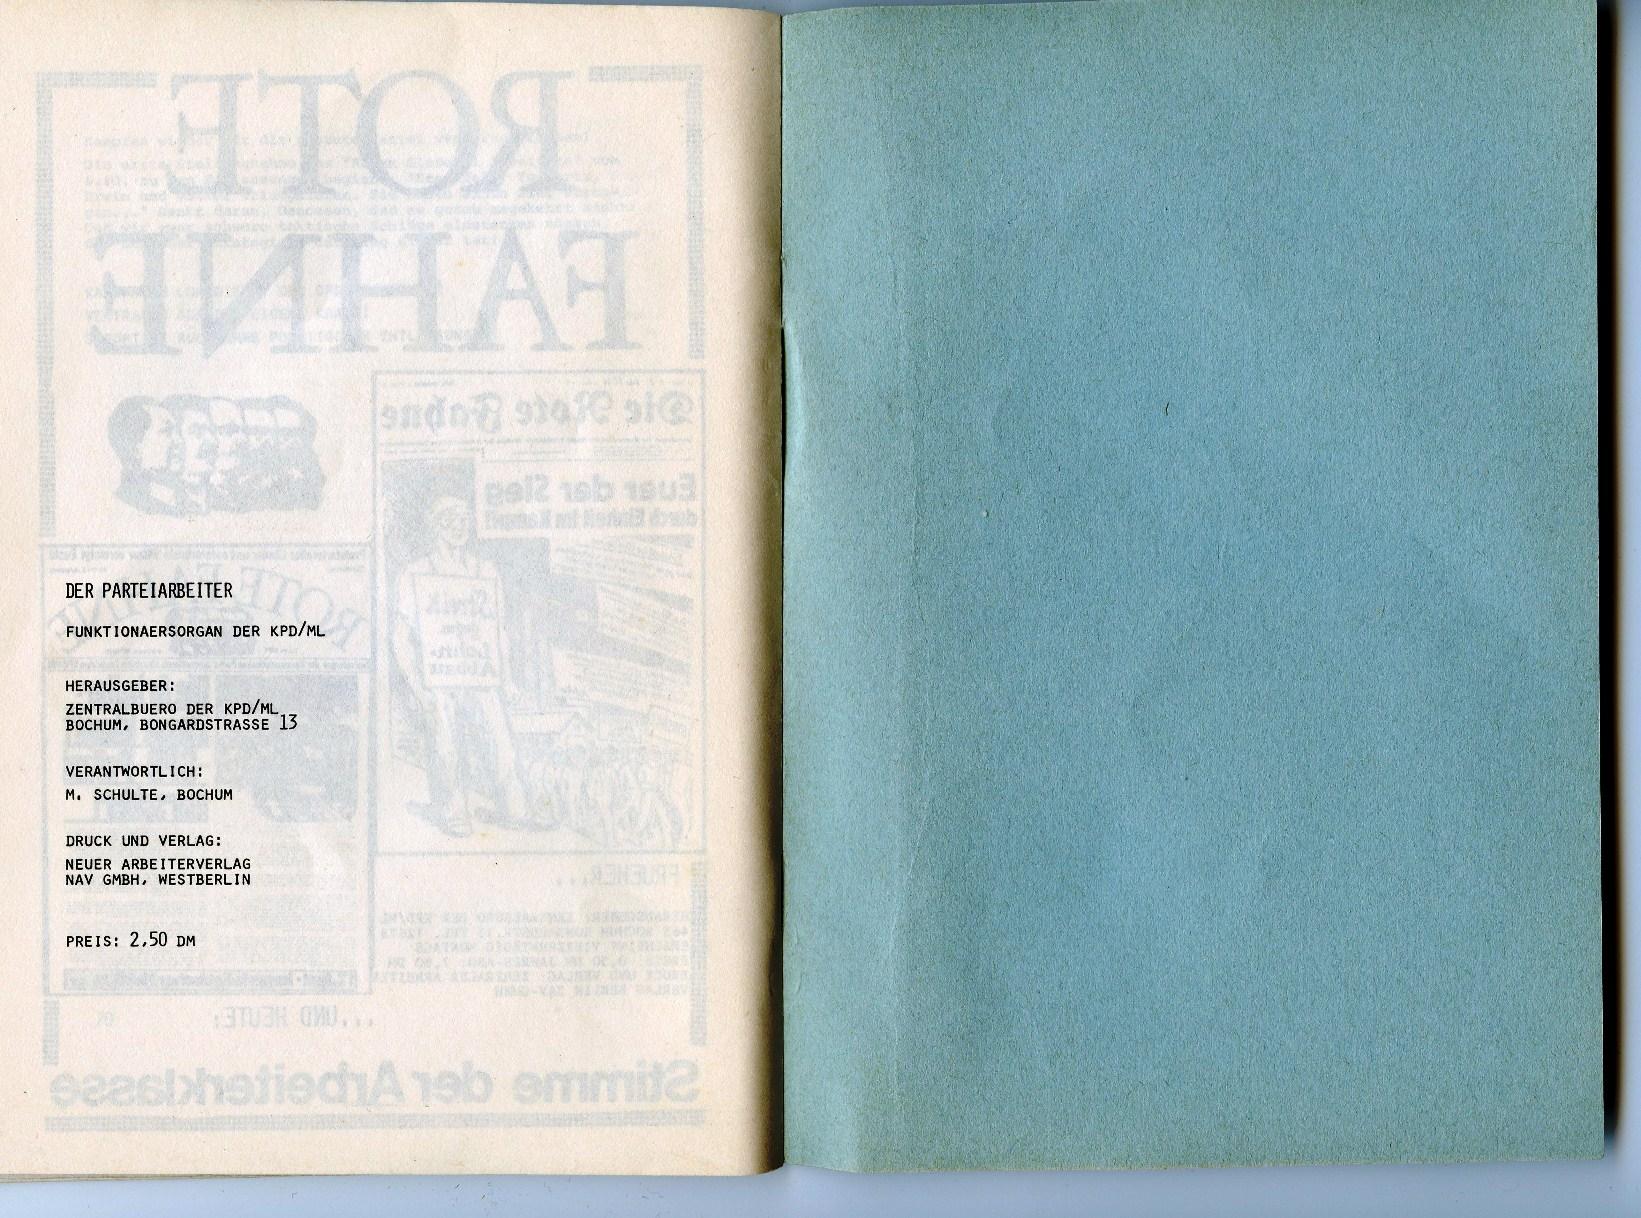 ZB_Parteiarbeiter_1971_09_37